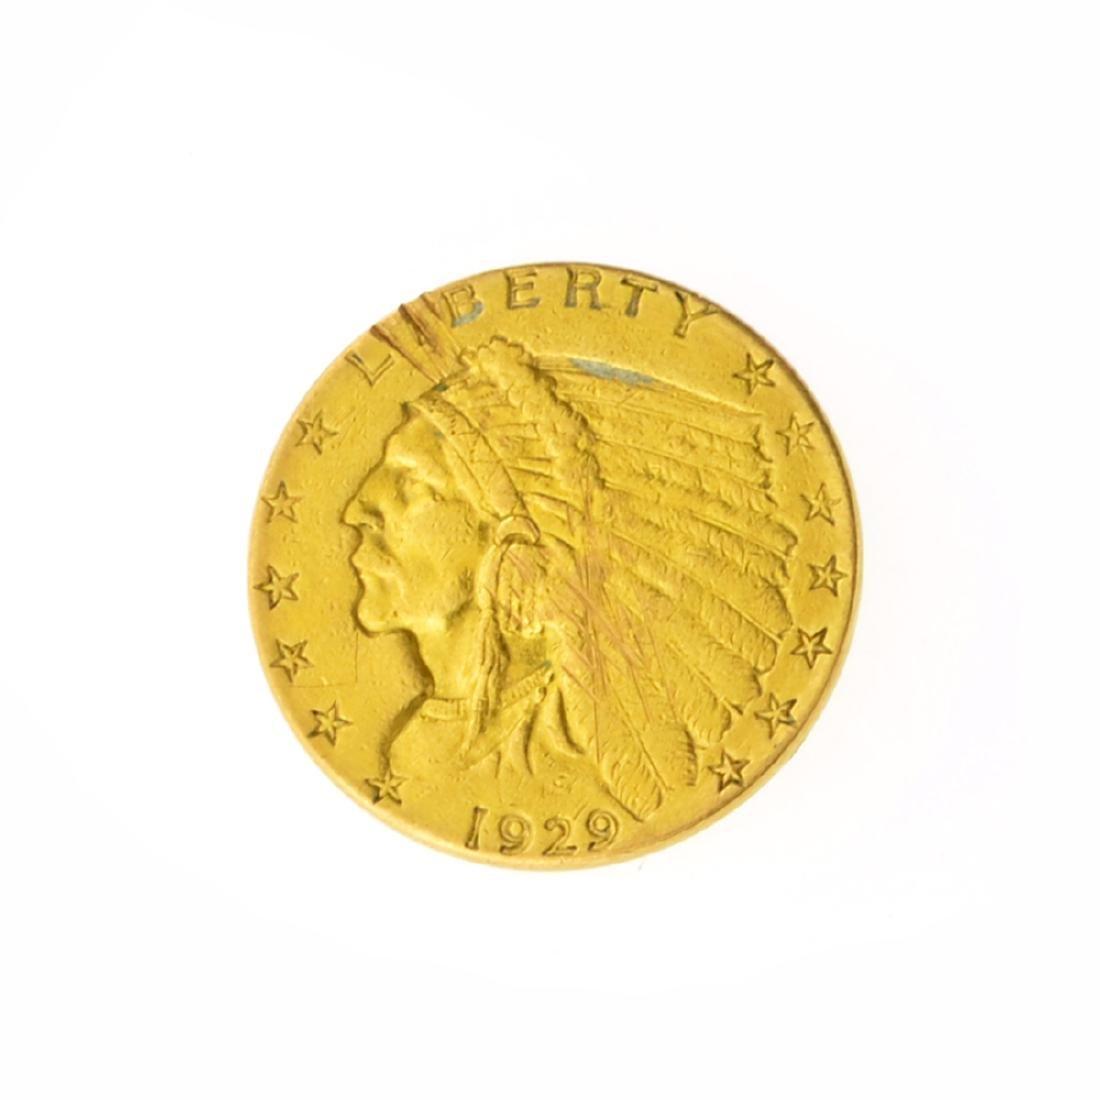 *1929 $2.50 U.S. Indian Head Gold Coin (JG)